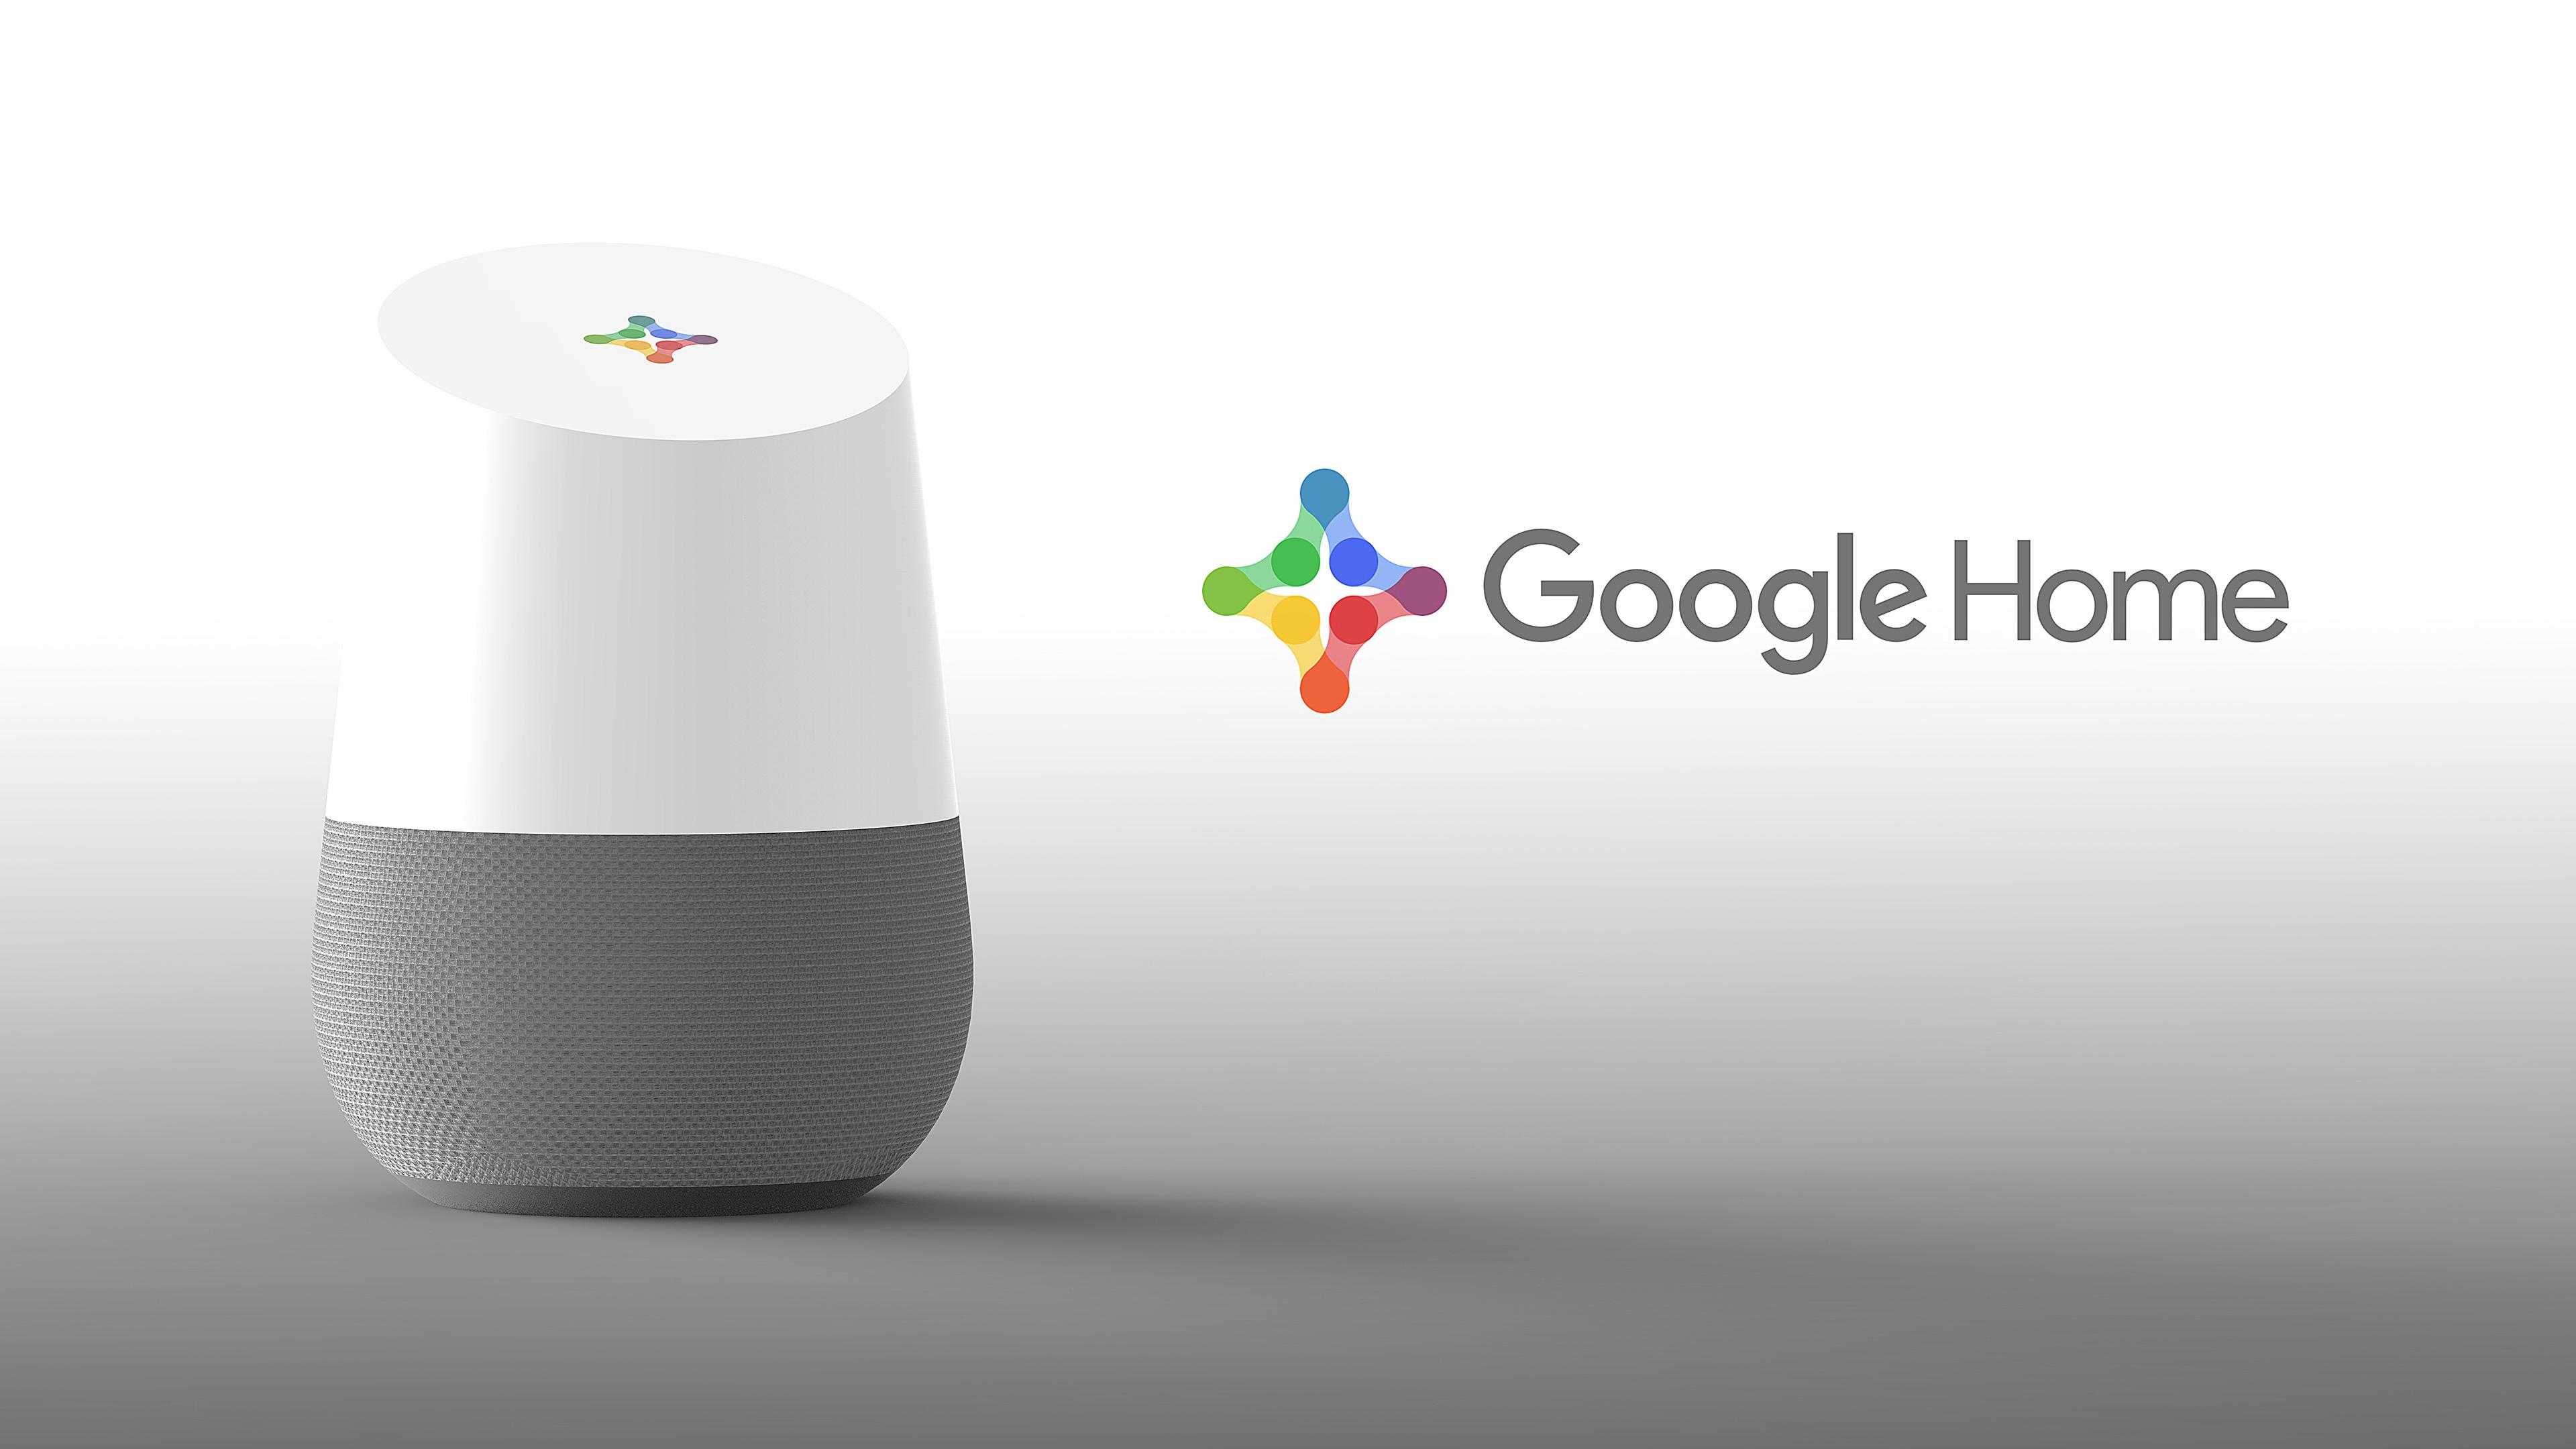 Peter Farago - GoogleHome Logo